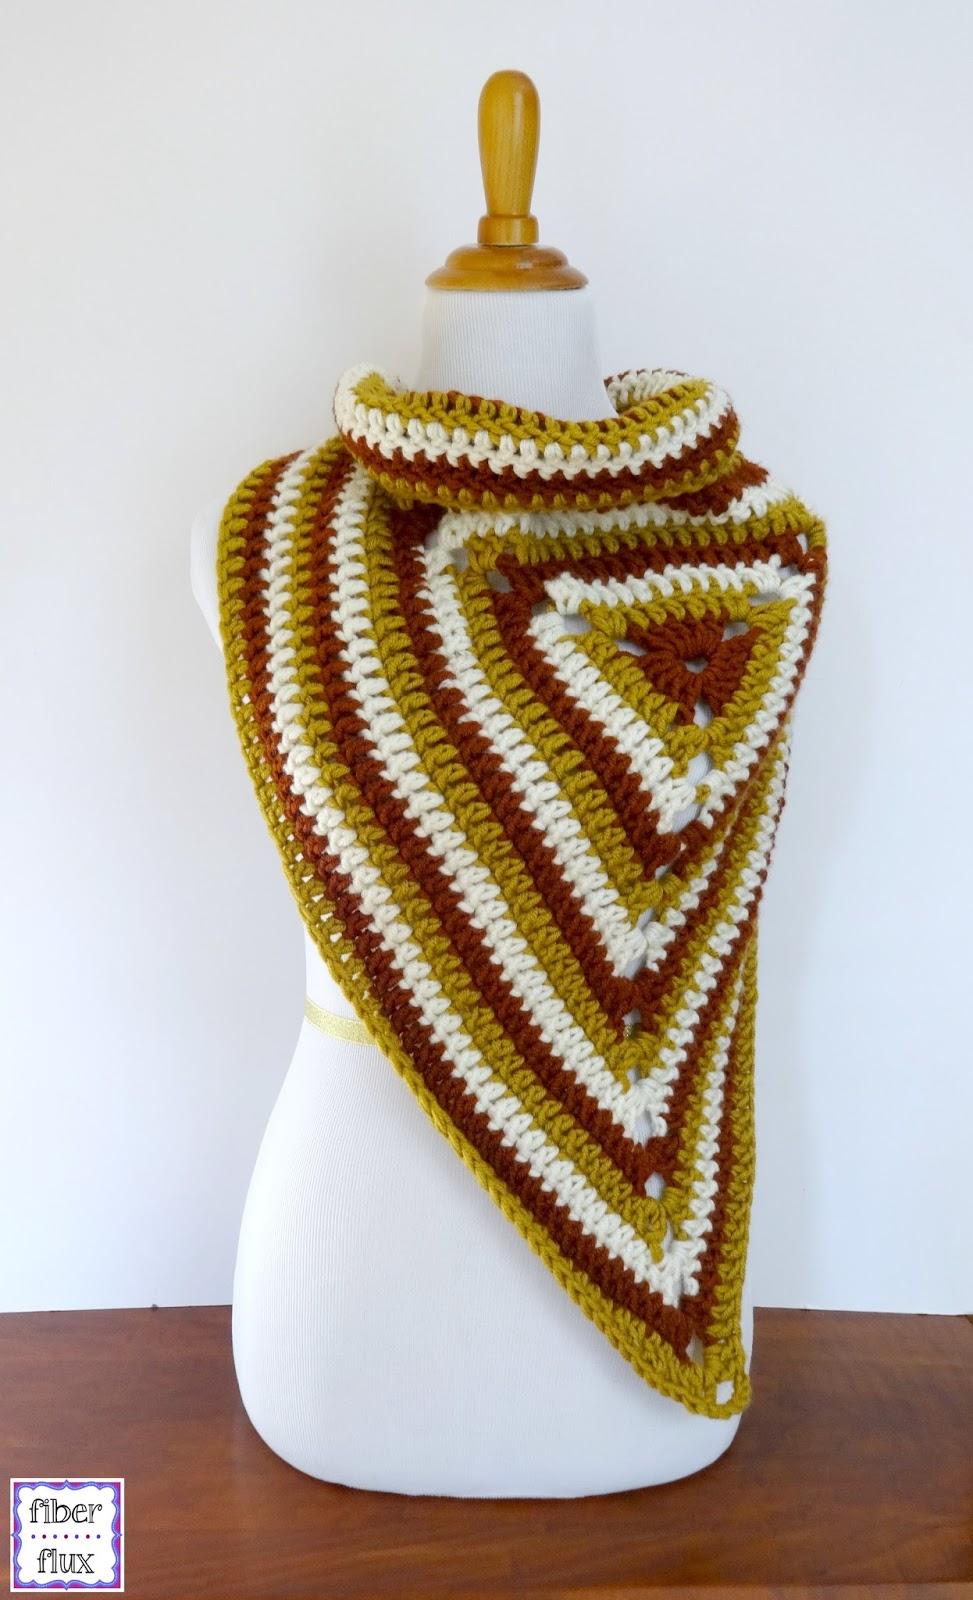 Free Crochet Pattern For Button Wrap : Fiber Flux: Free Crochet Pattern...Renaissance Button Wrap!